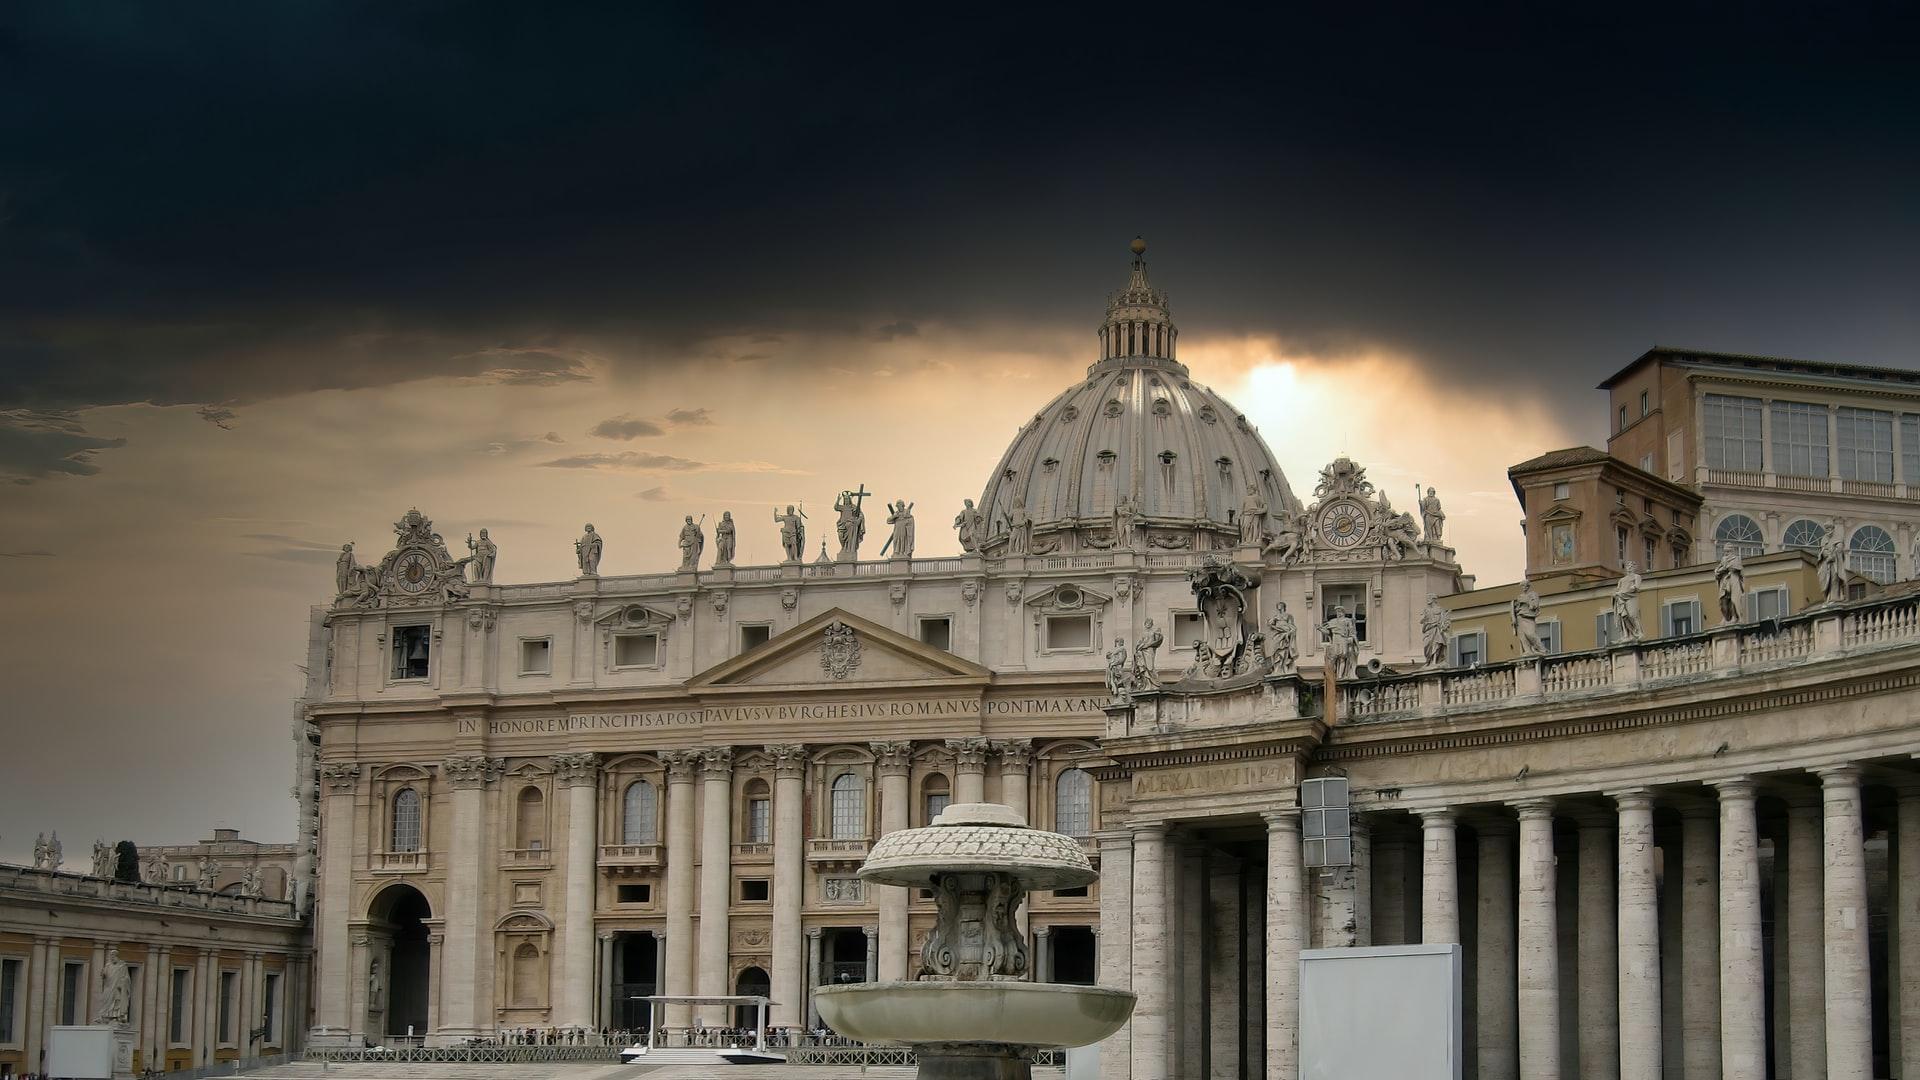 The Vatican is not a Christian organization, but a Satanic organization